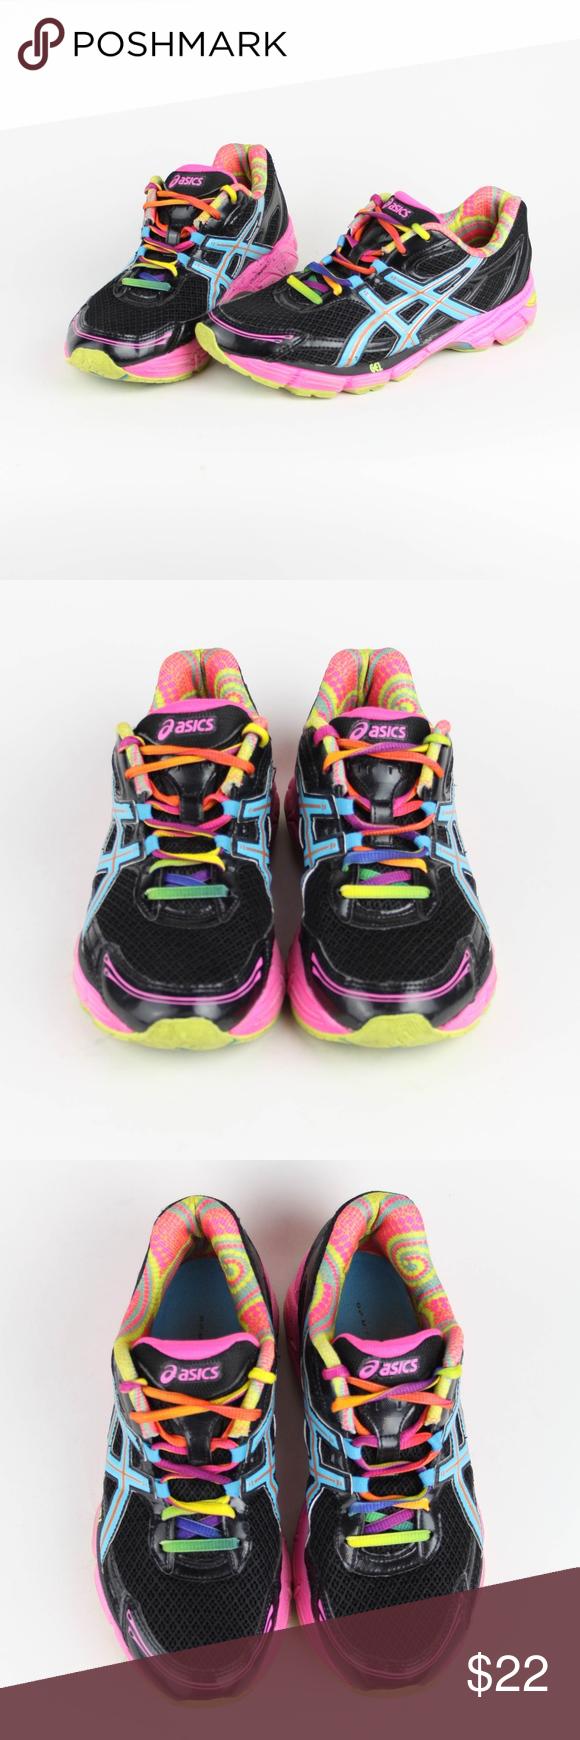 Asics Womens Shoes Sneakers Gel Enhance